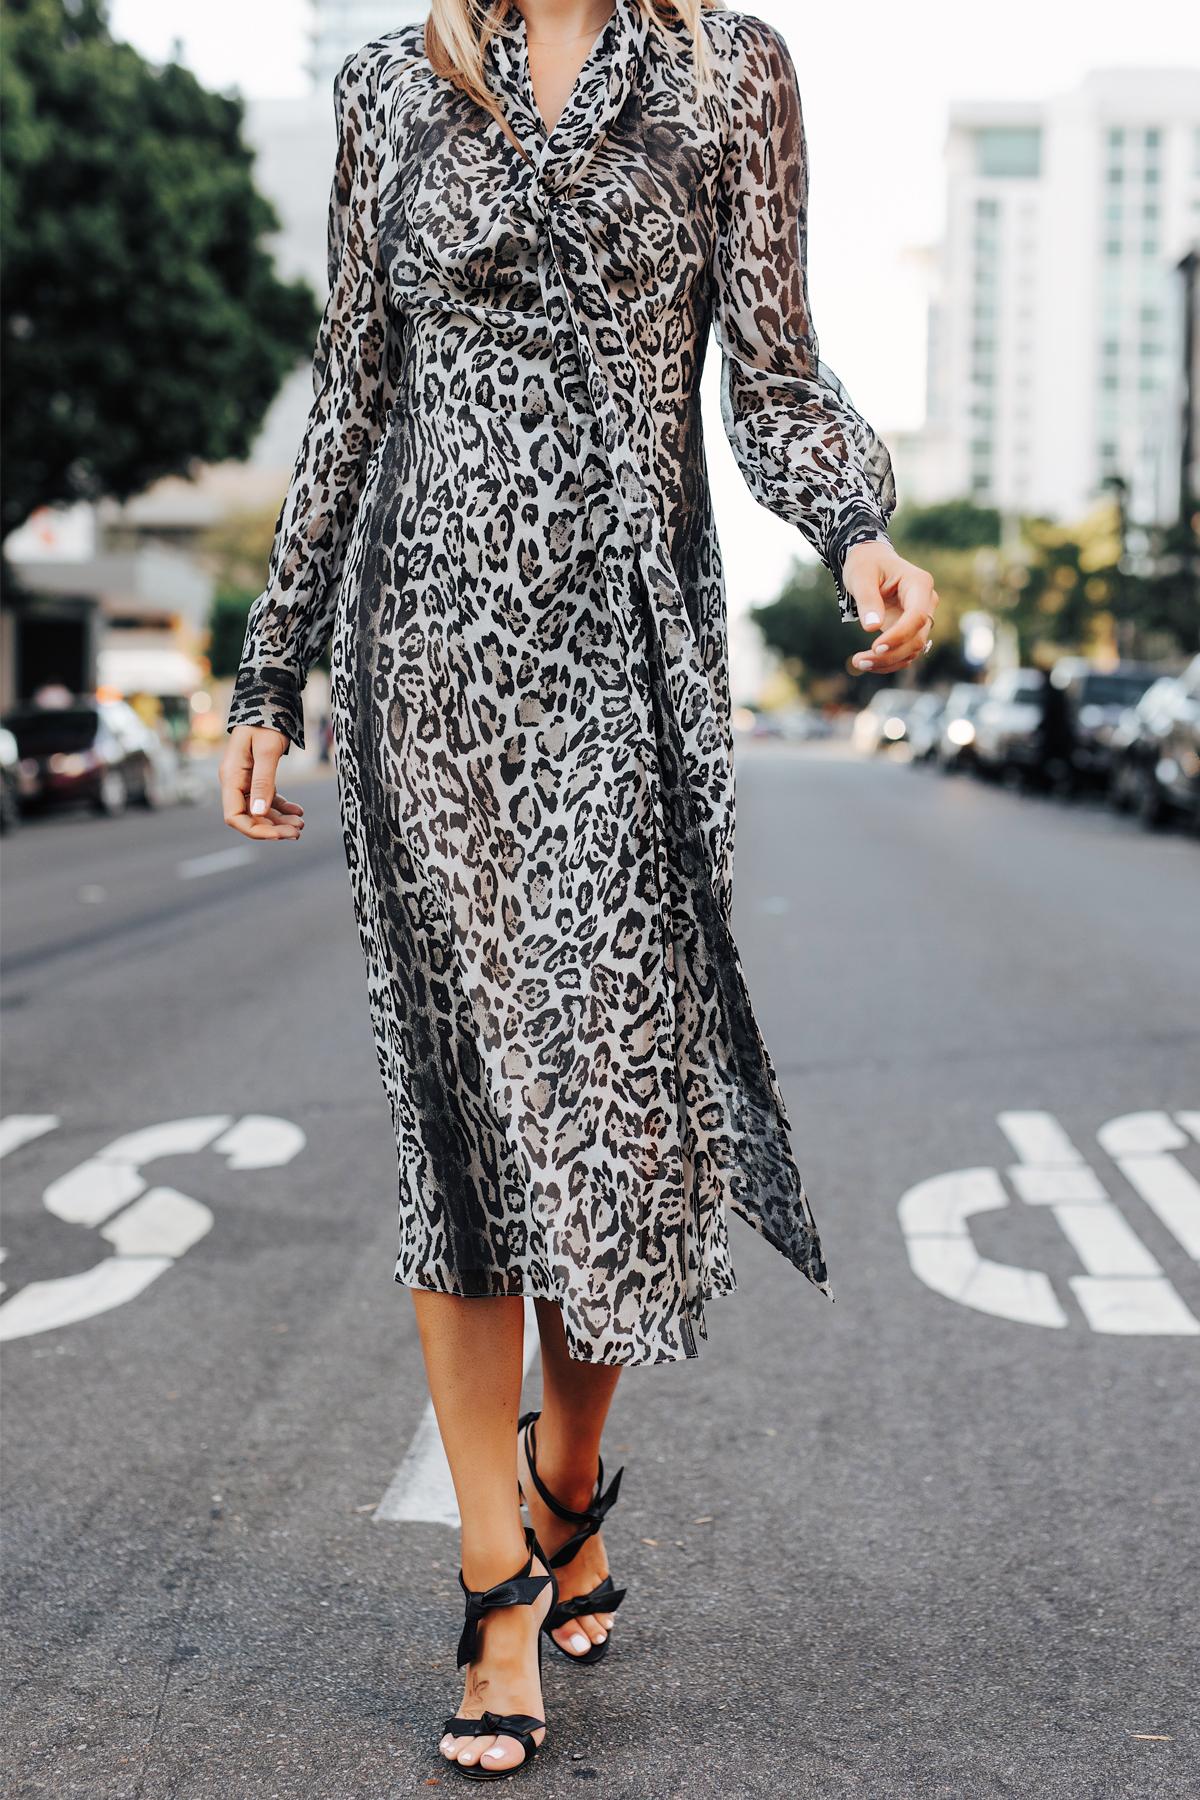 Fashion Jackson Wearing tommy hilfiger zendaya collection snow leopard dress Black Tie Heeled Sandals 2